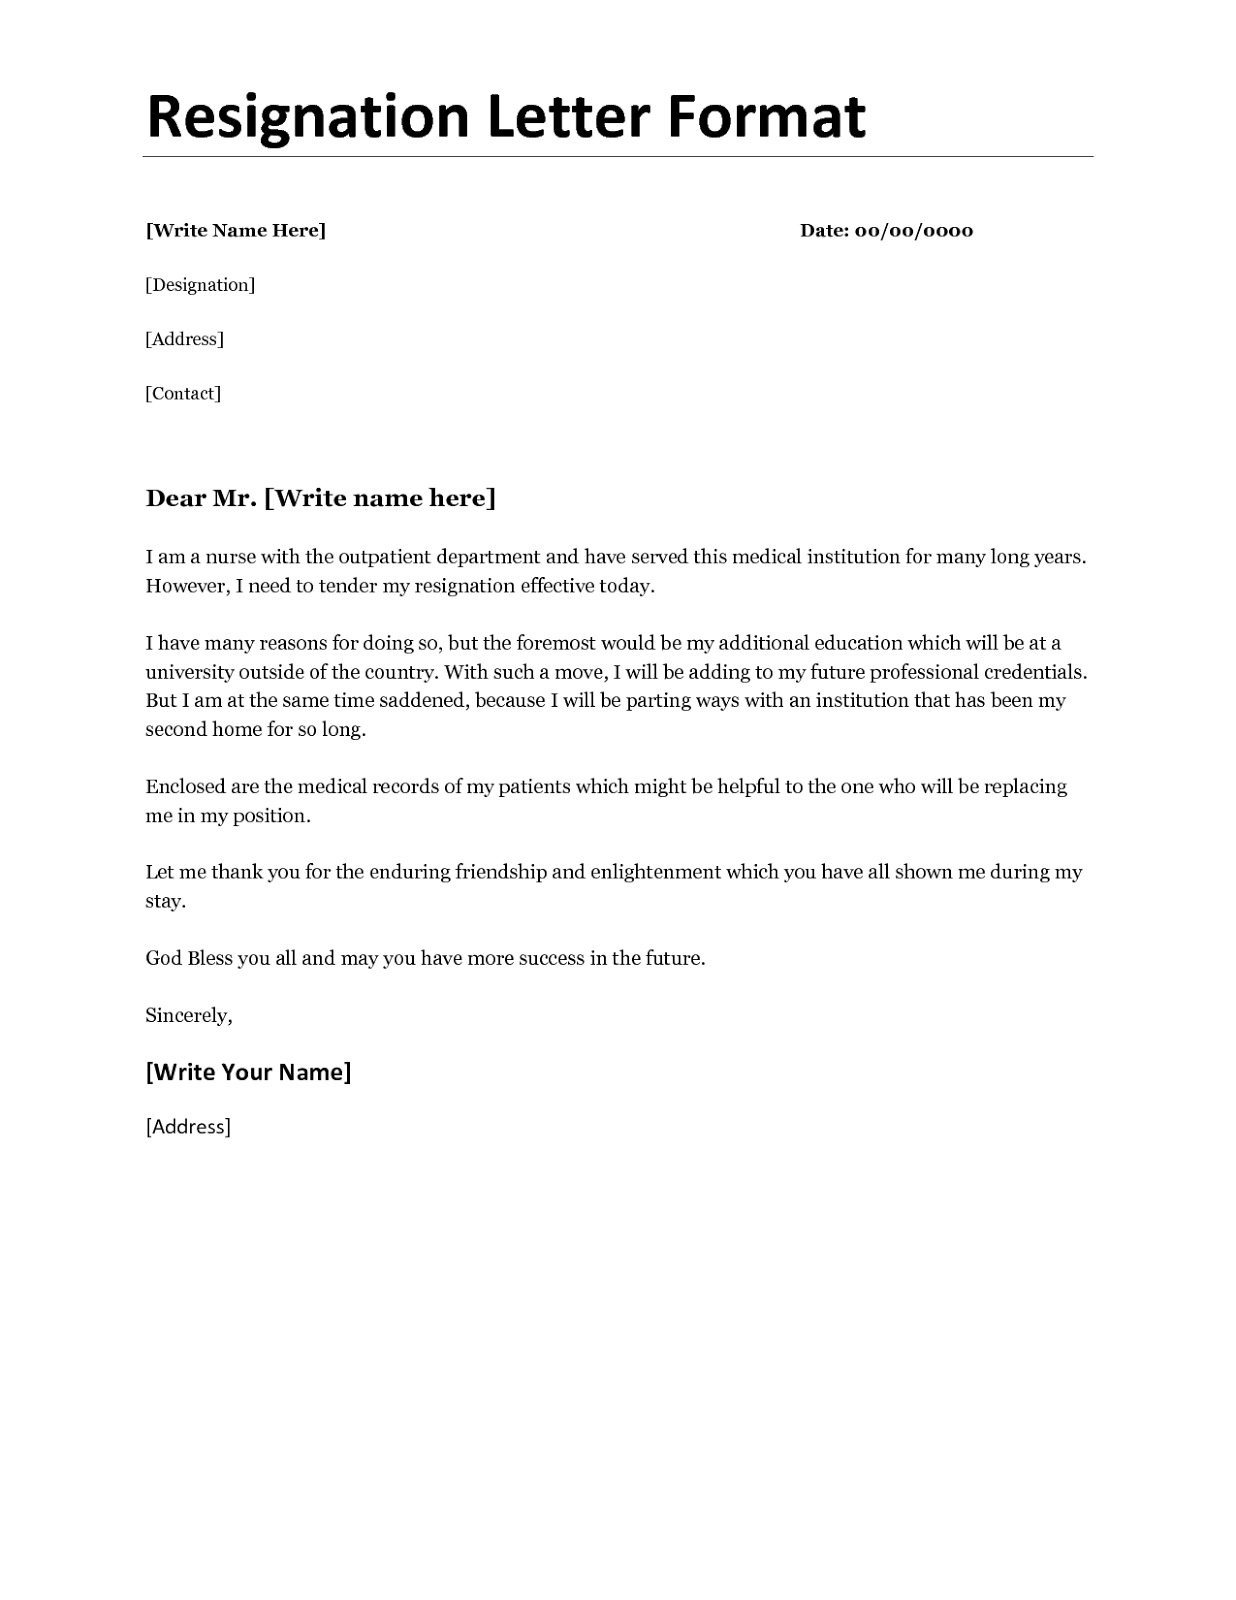 hr resignation letter format  resignation letter example - hr resignation letter format